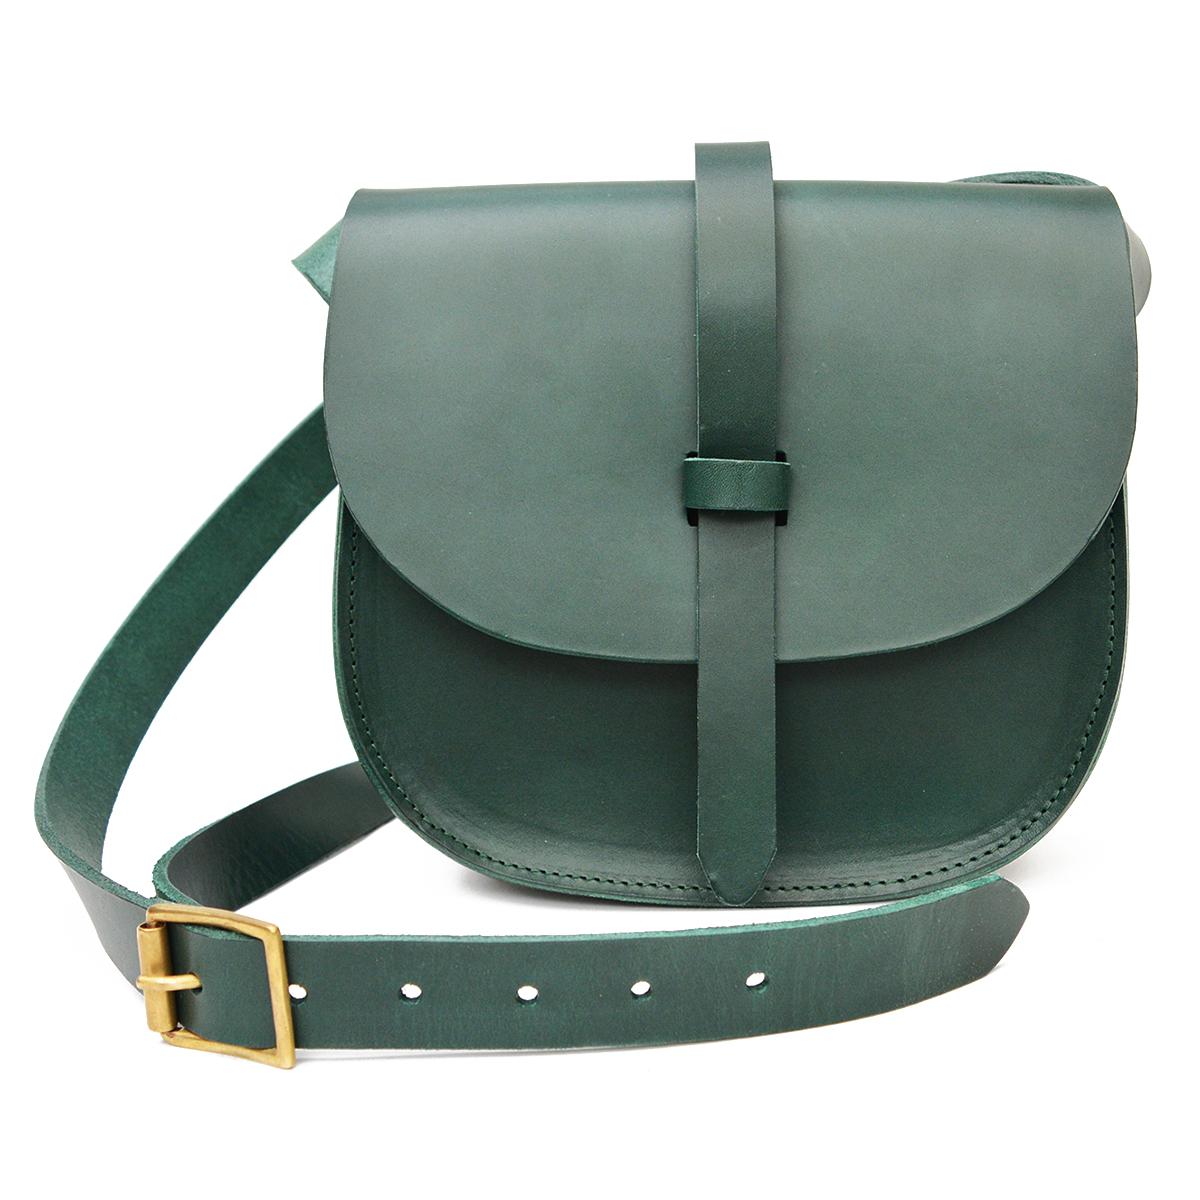 Dark green saddle bag by Natthakur